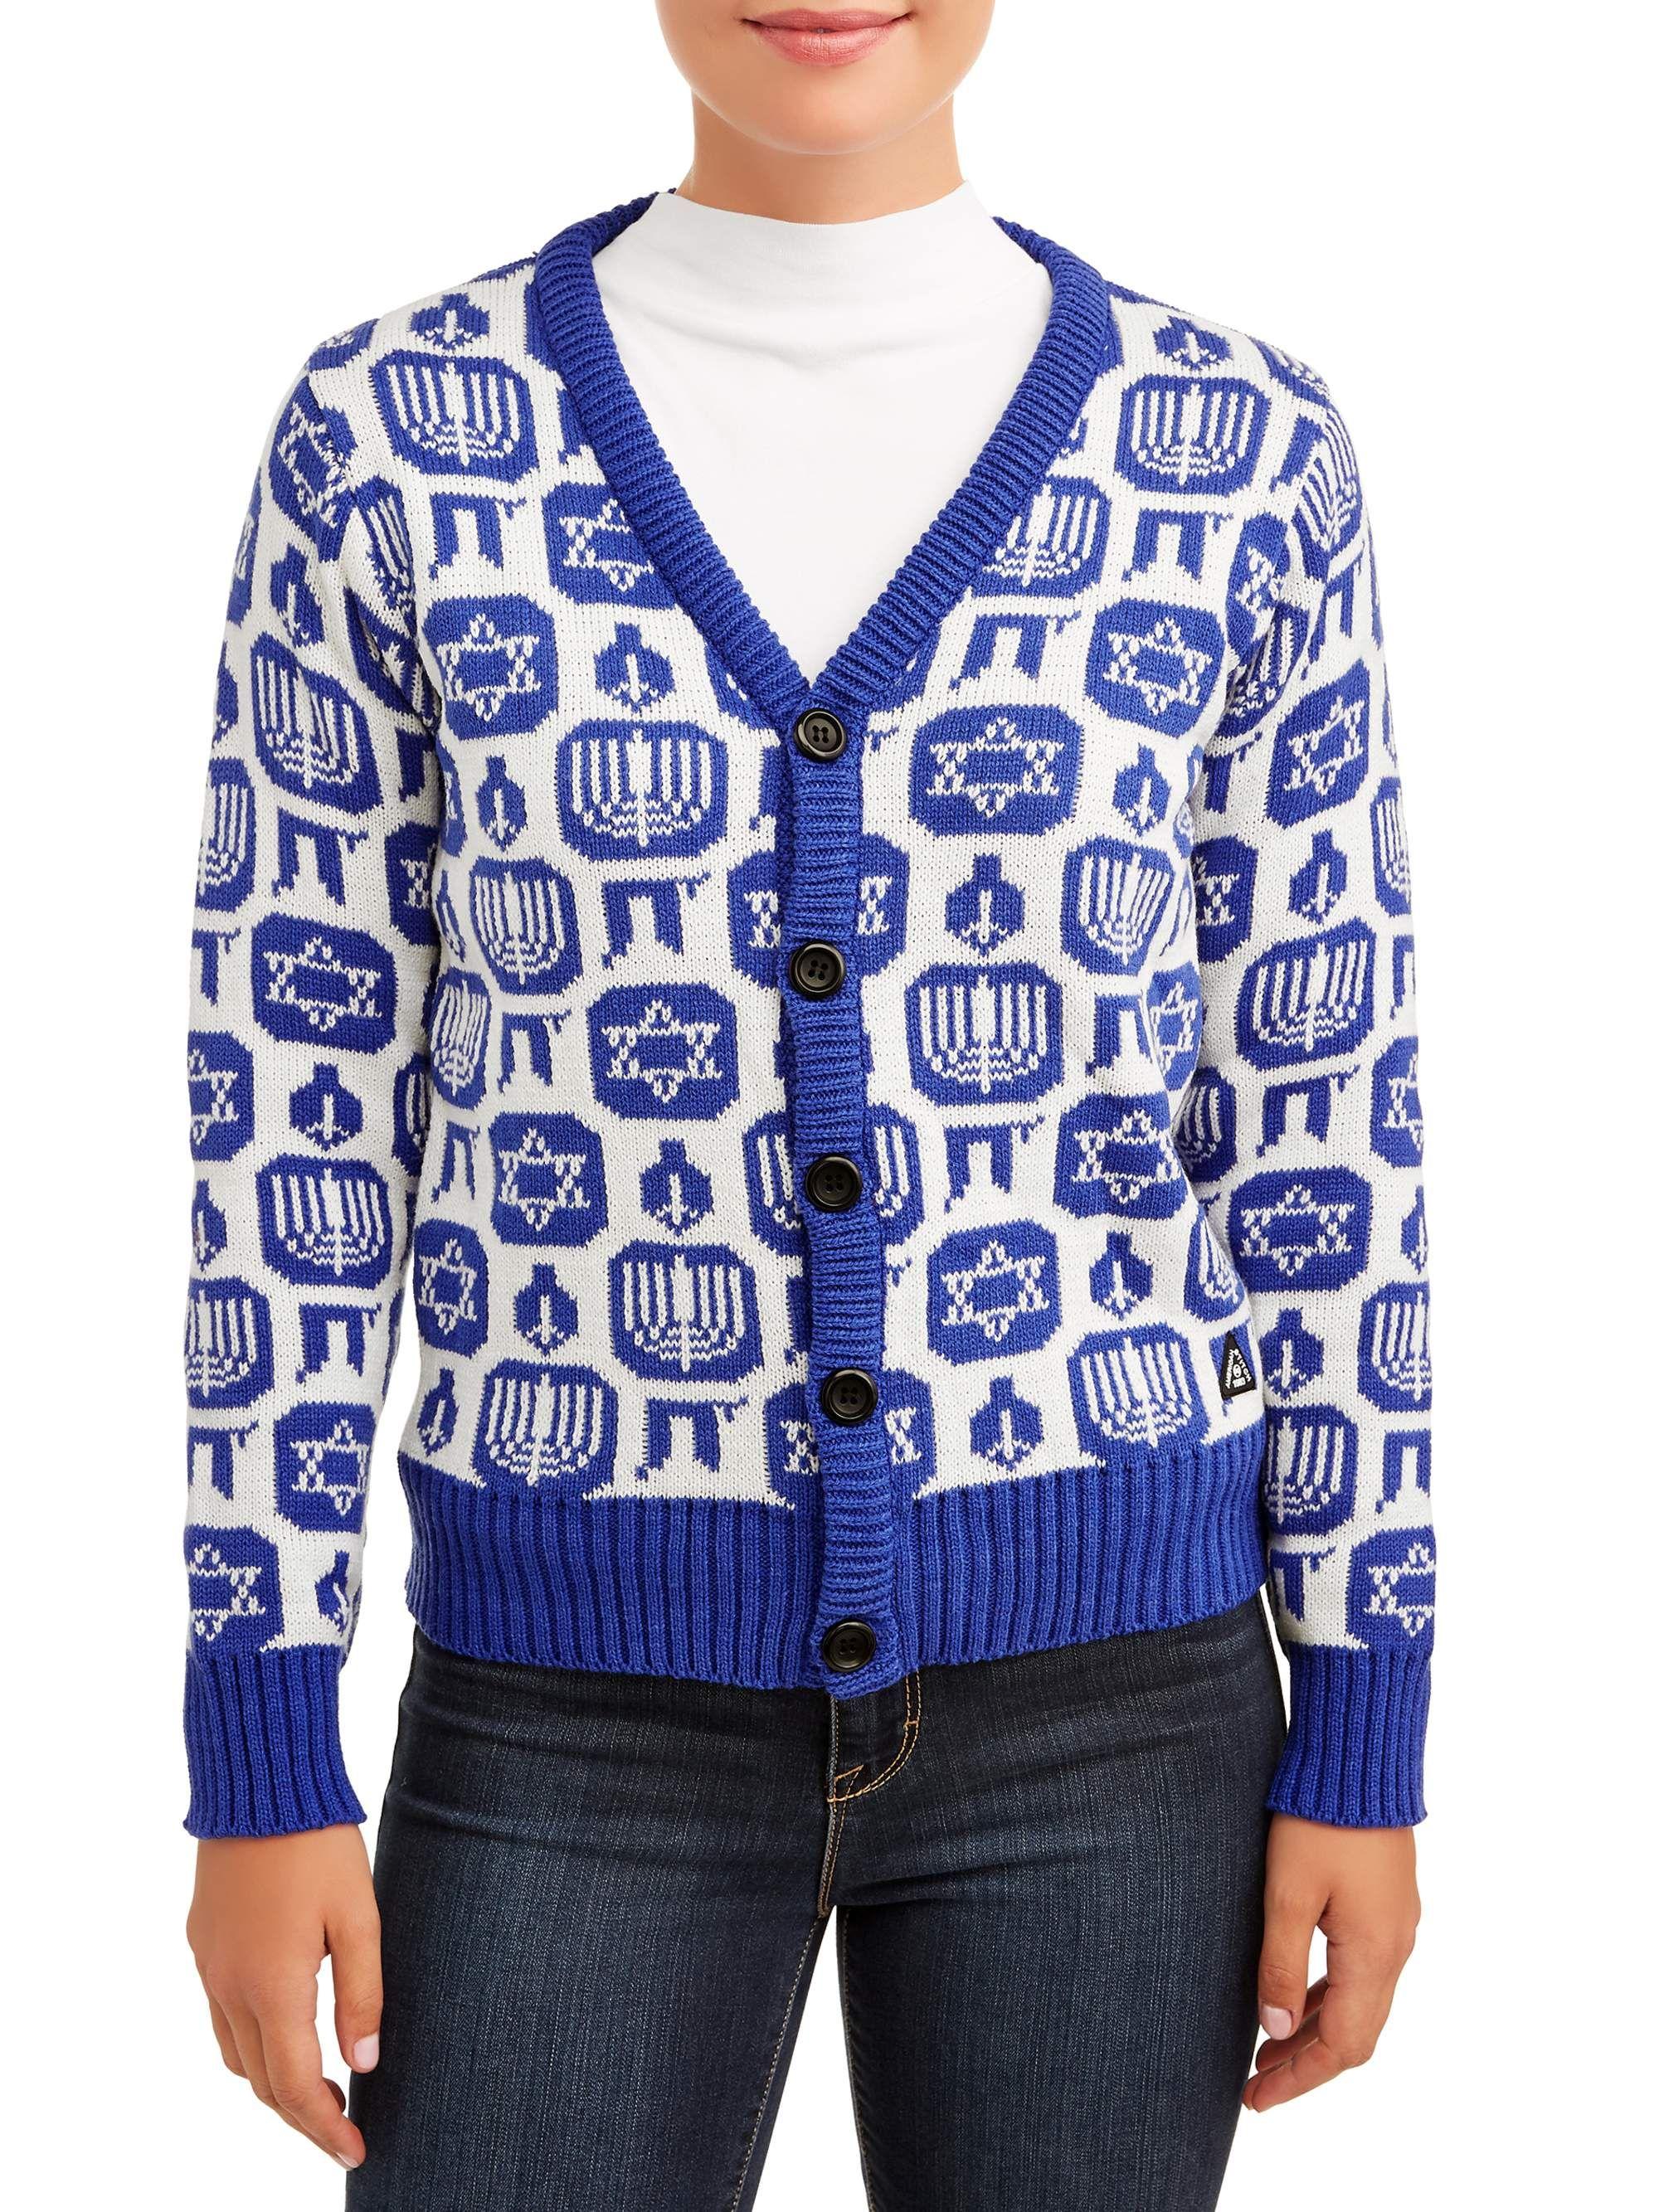 Free 2day shipping. Buy American Stitch Women's Hanukkah